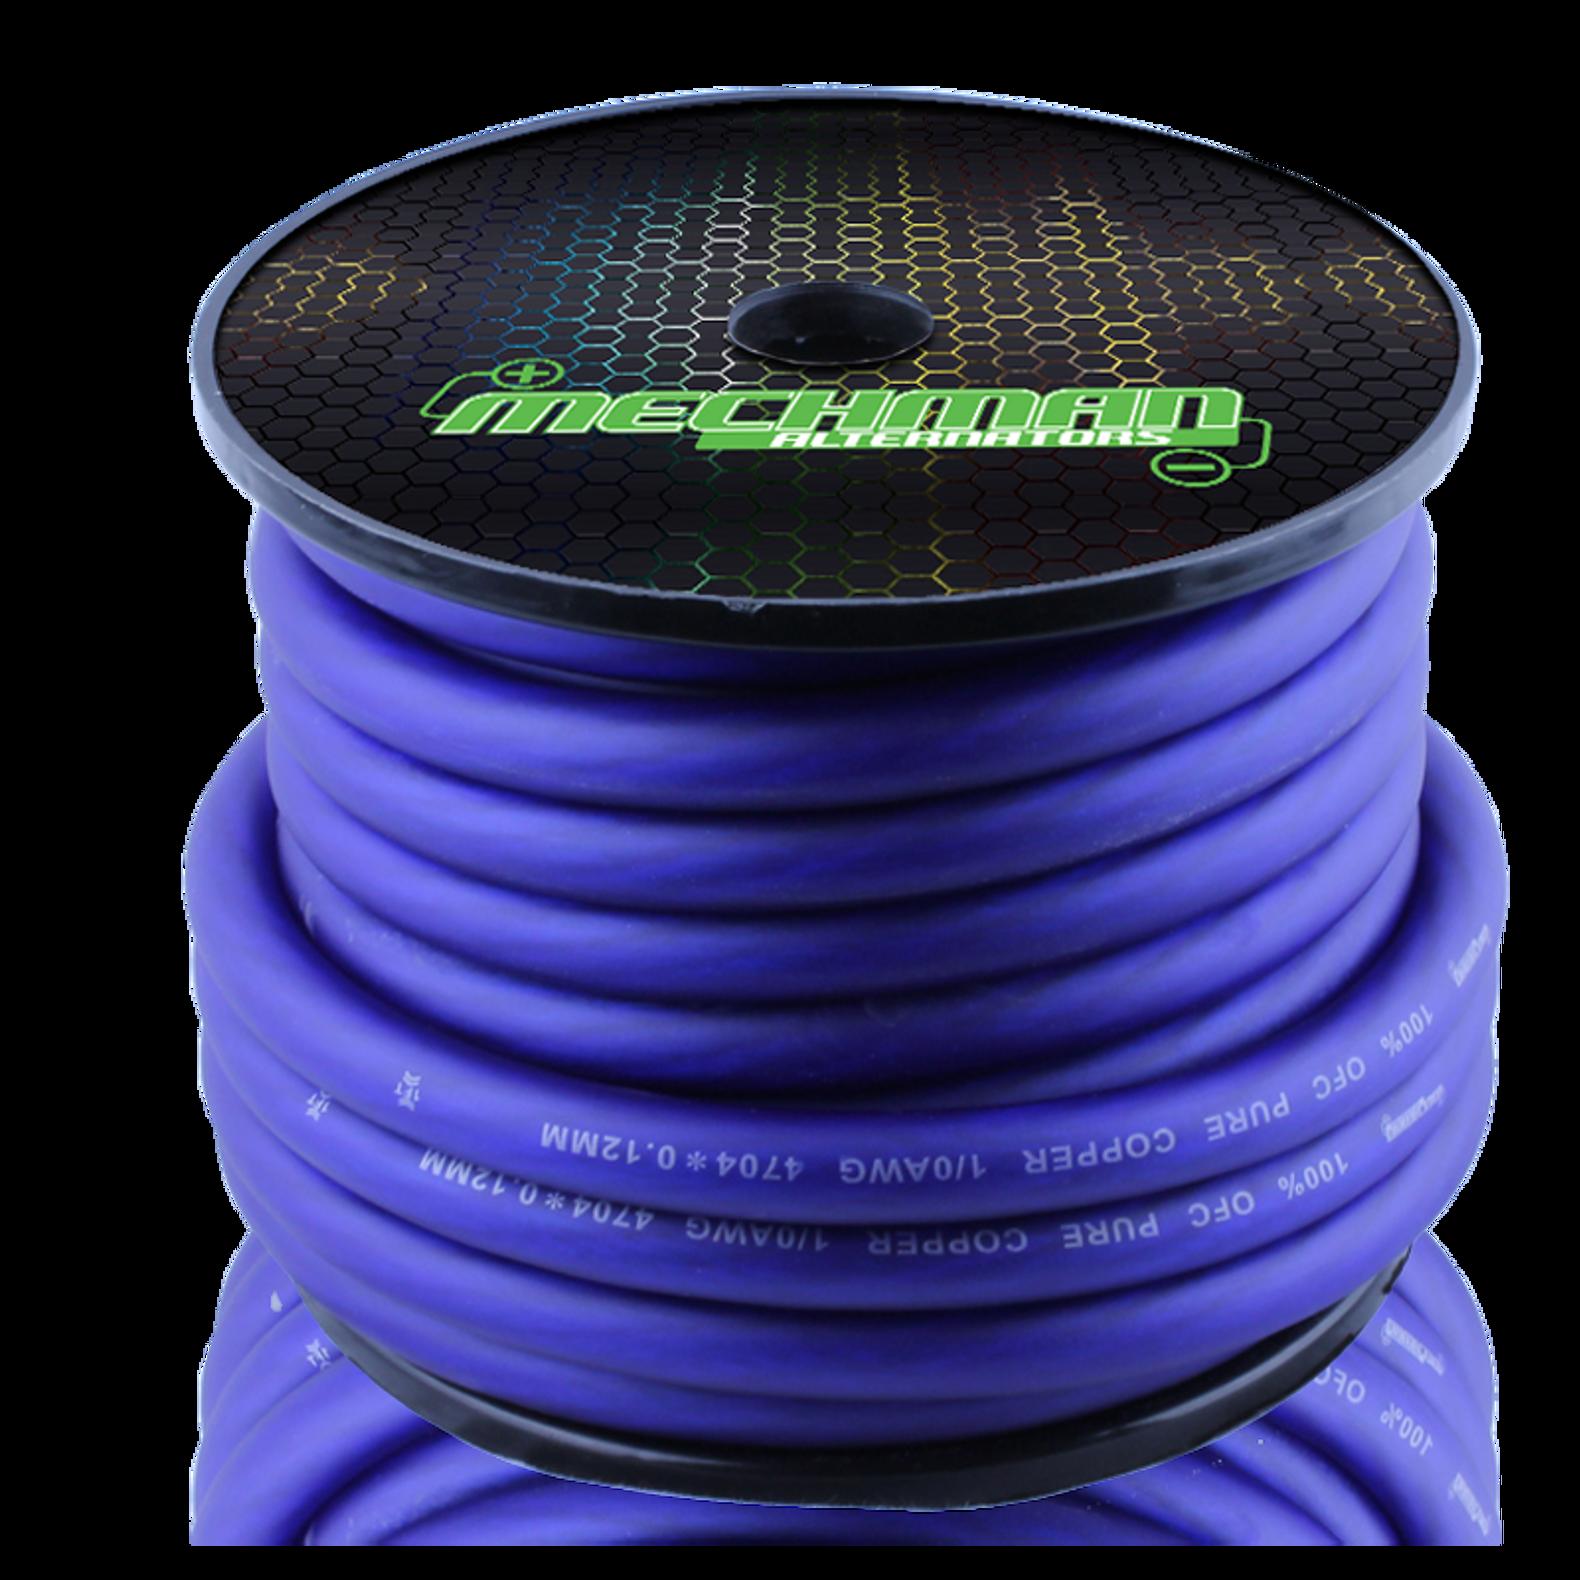 1 0 gauge ofc power cable 50 foot spool blue ssa store rh store soundsolutionsaudio com